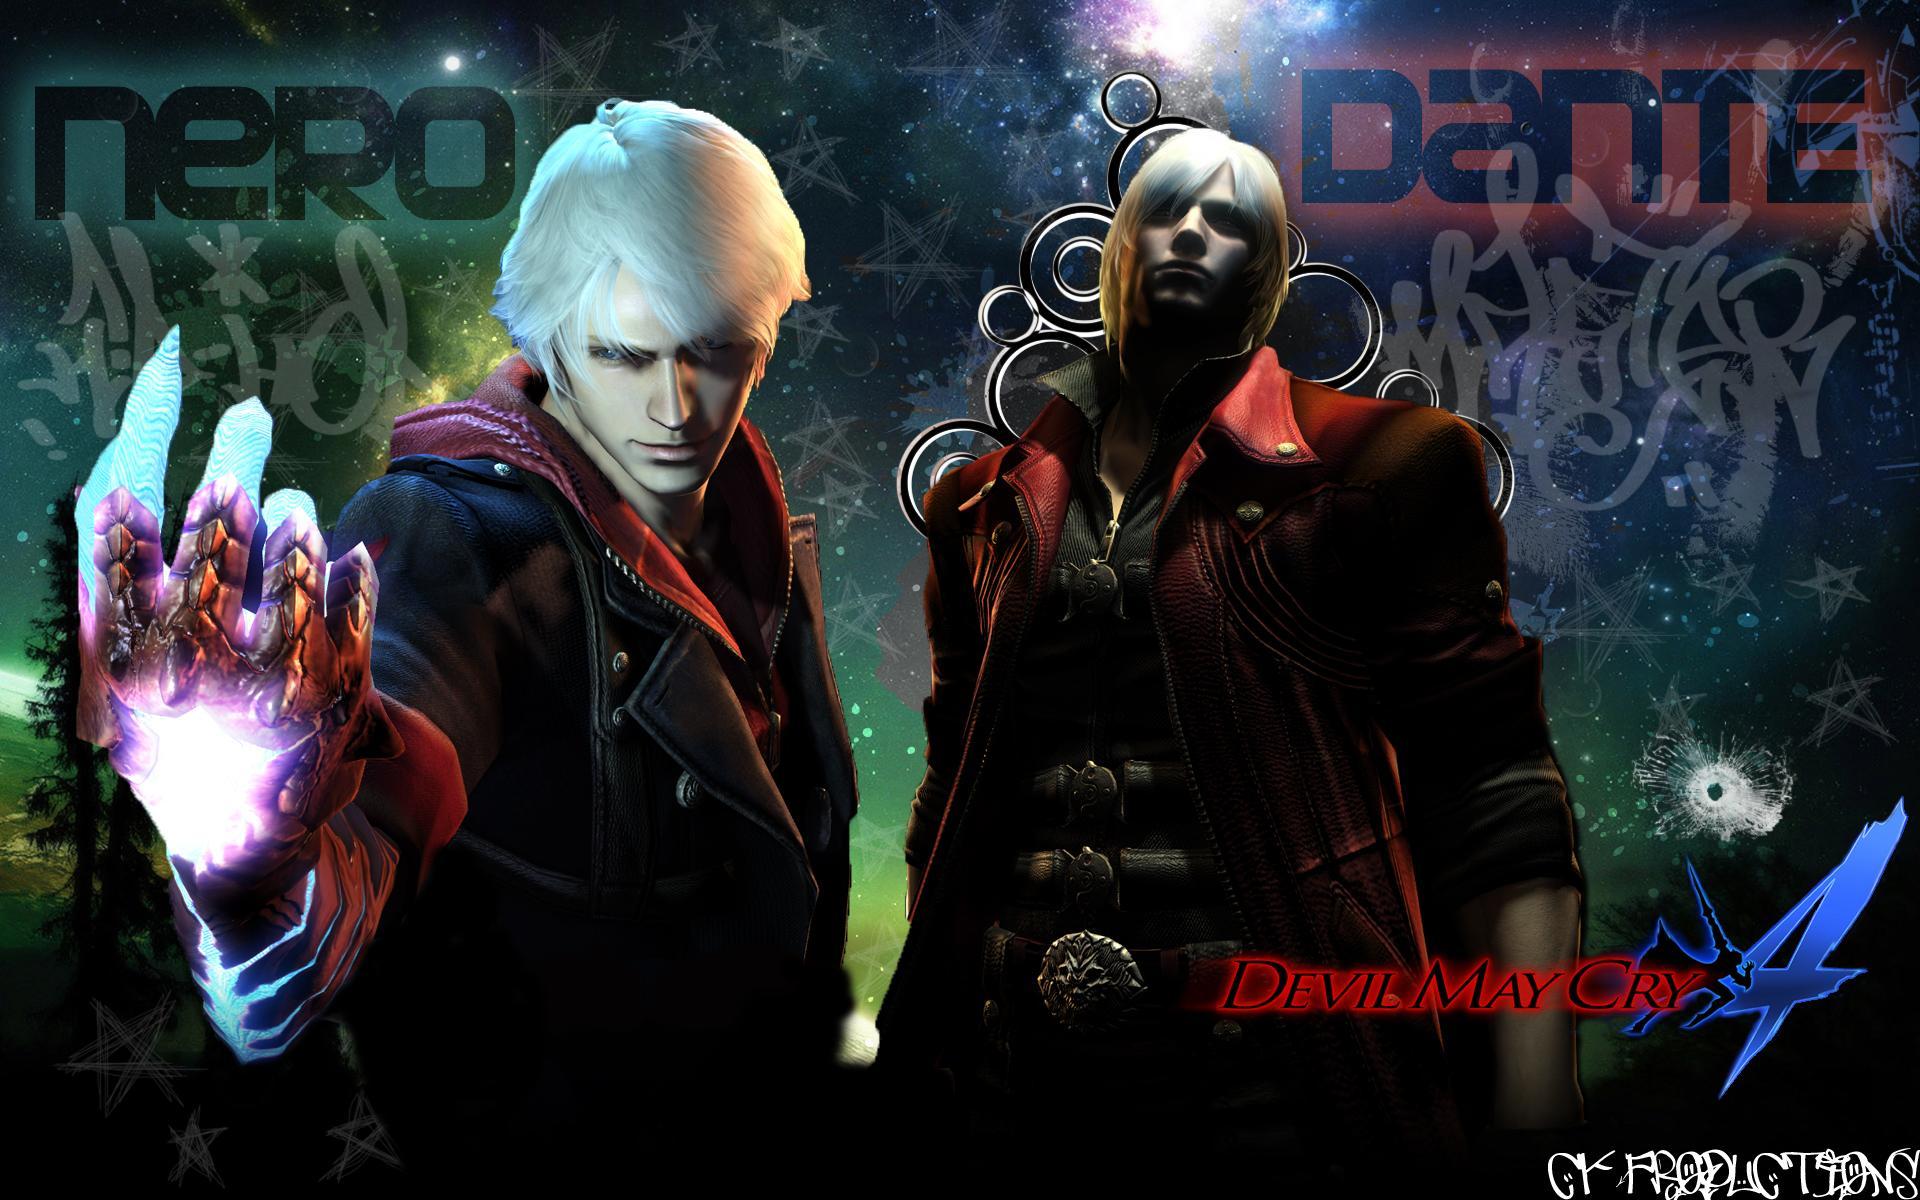 Free Download Devil May Cry 4 Wallpaper Nero Hd 1920x1200